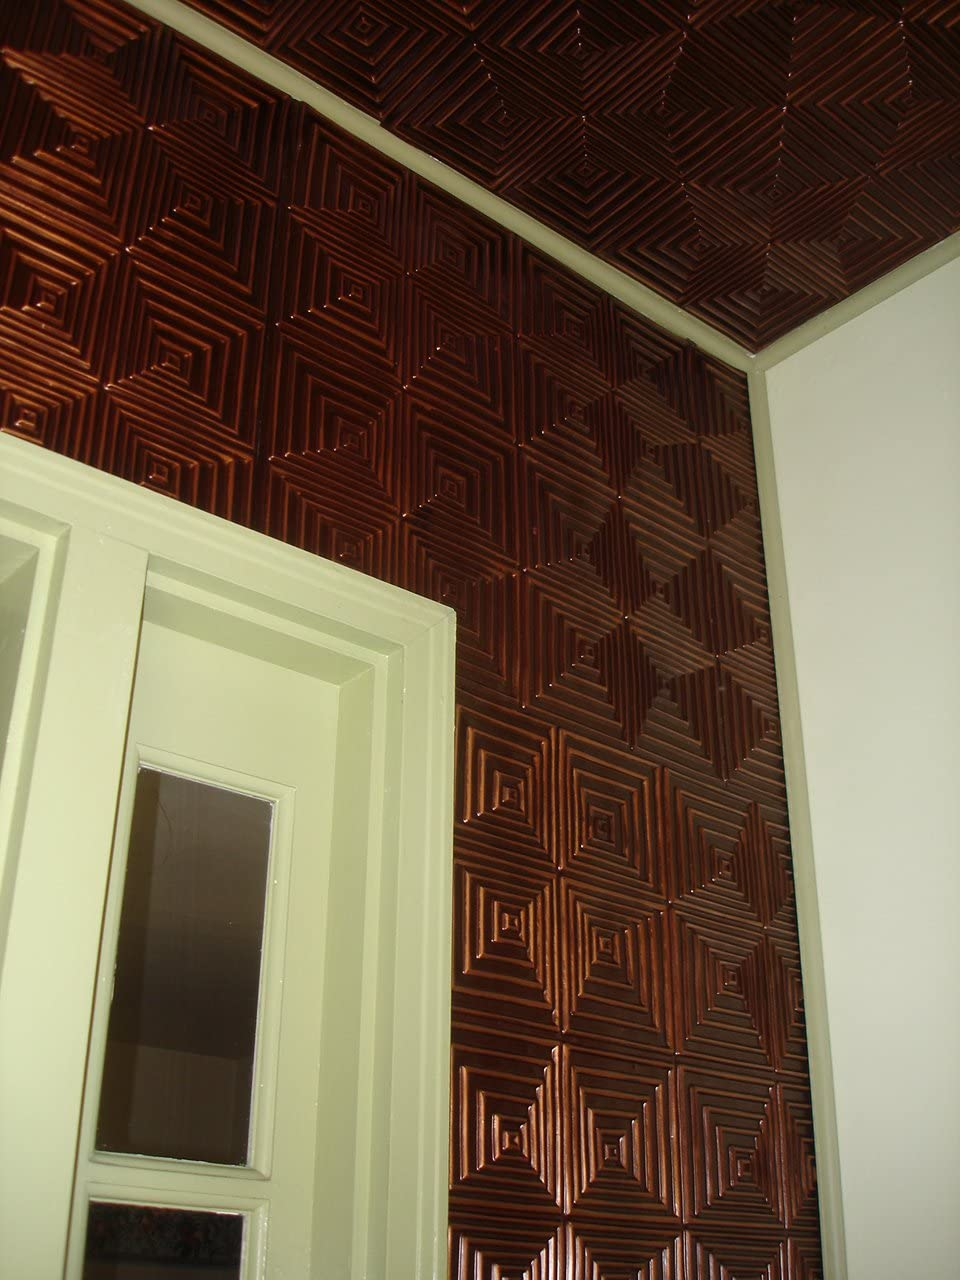 - Amazon.com: Decorative Plastic Backsplash From Ceiling Tiles By Us